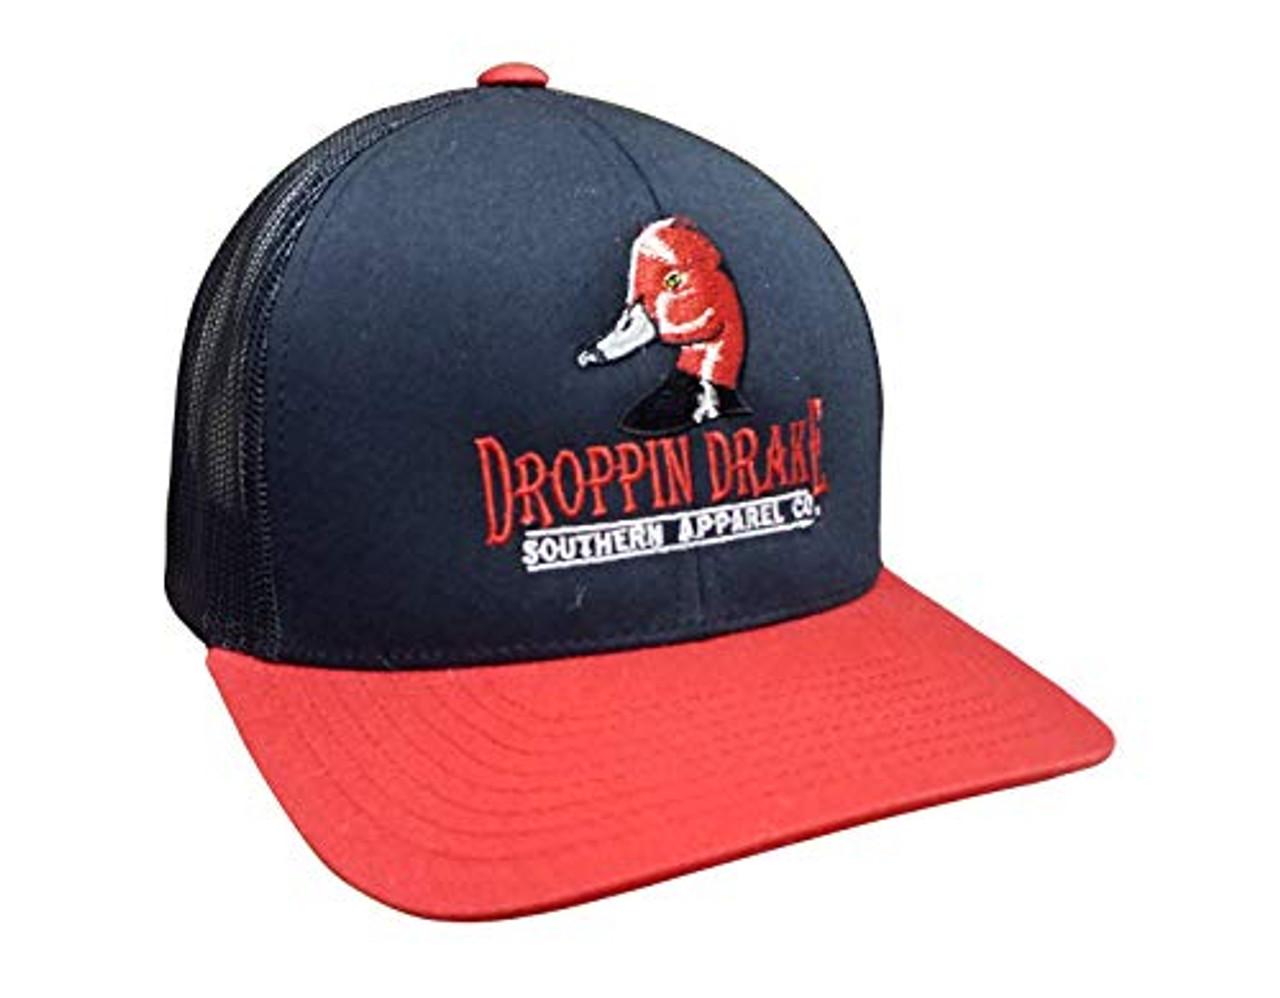 dbcec7b0e56 Droppin Drake Redhead Duck Logo Mesh Back Trucker Hat - Trenz Shirt Company